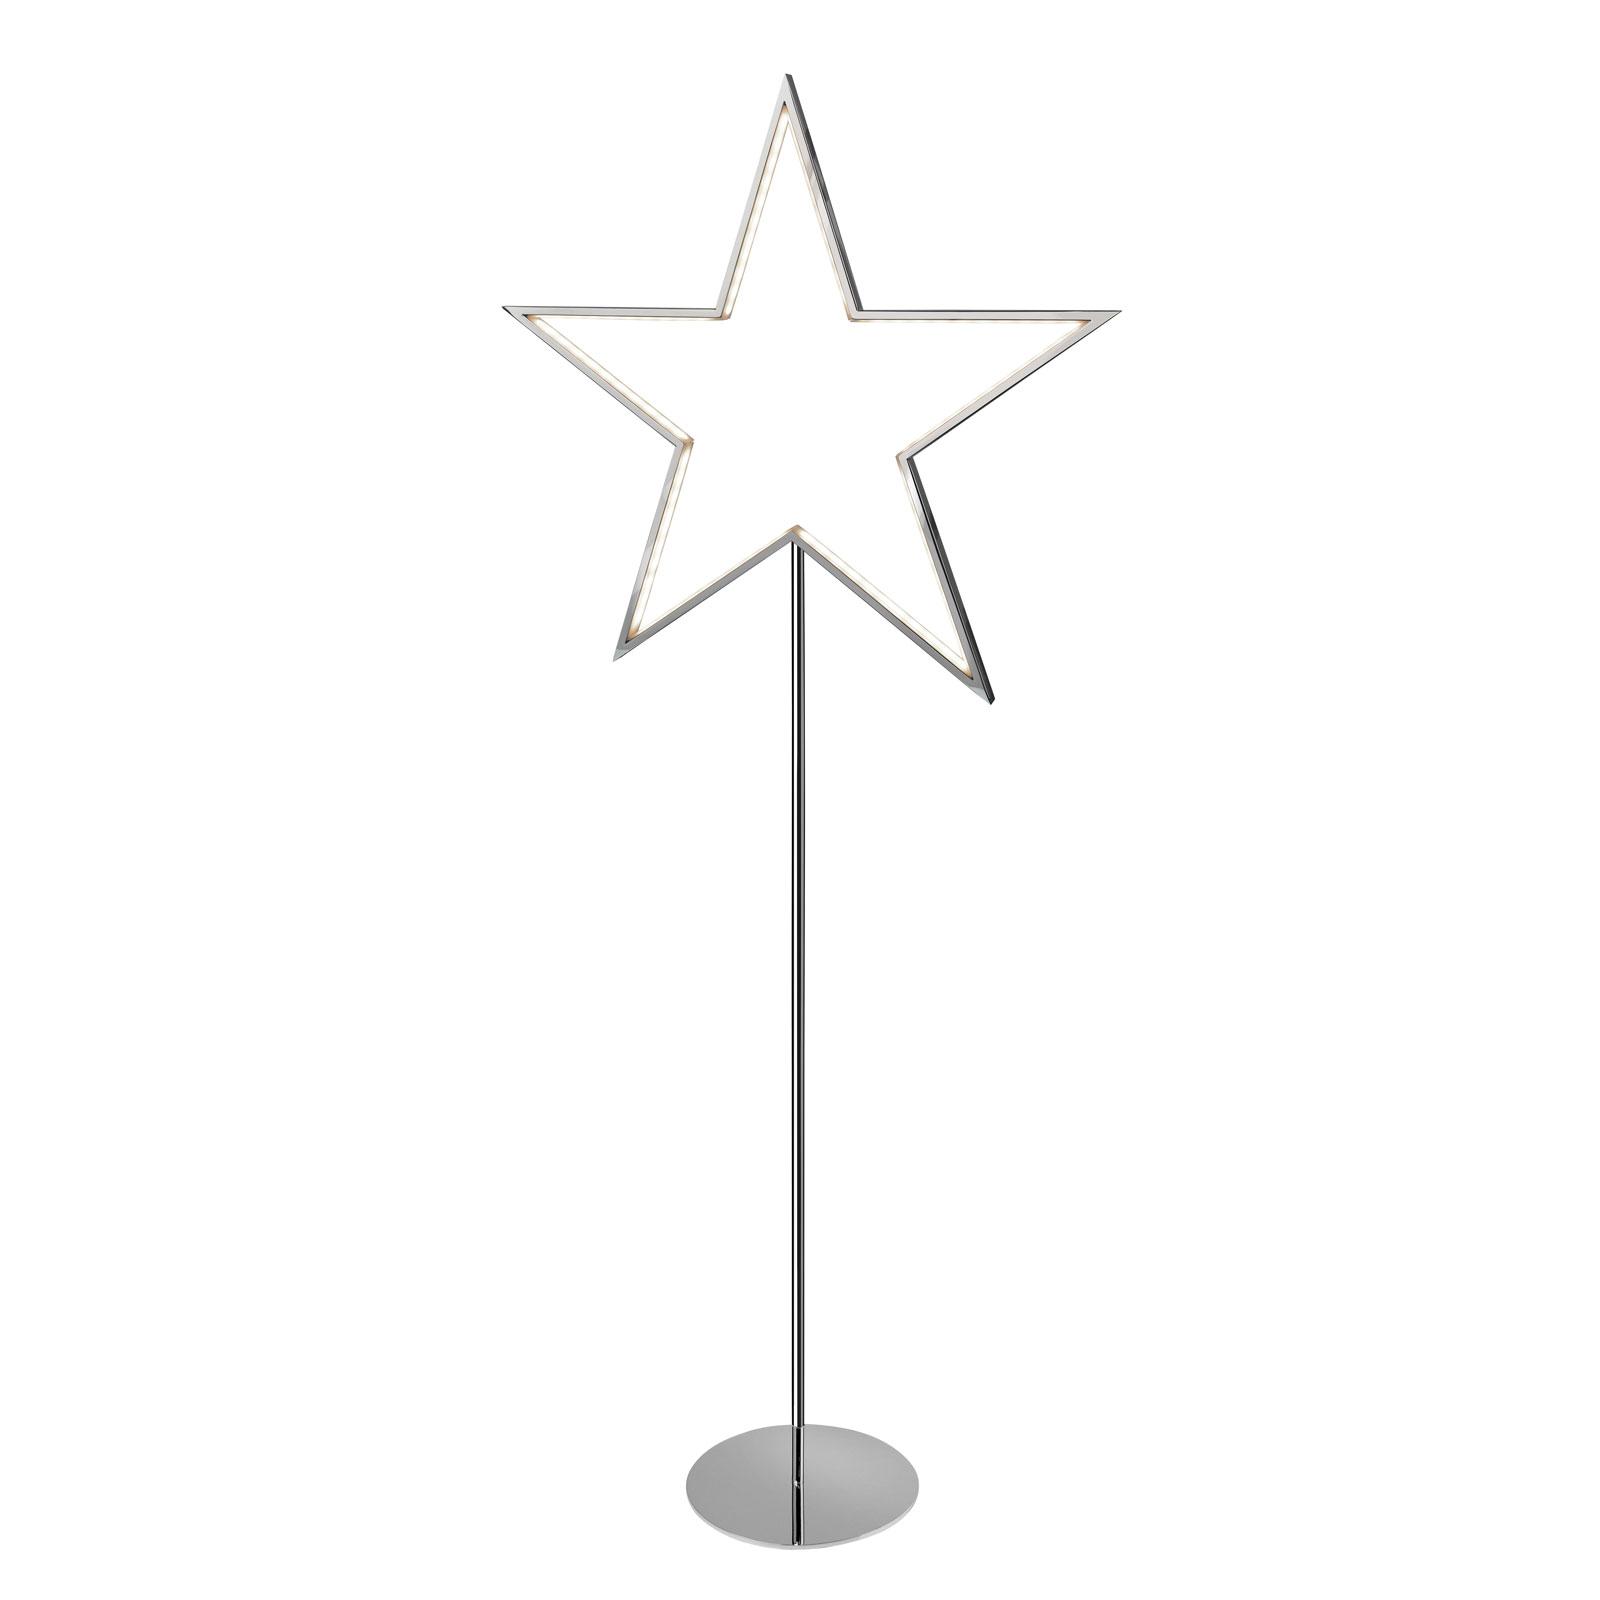 Lucy star decorative light, chrome, height 100 cm